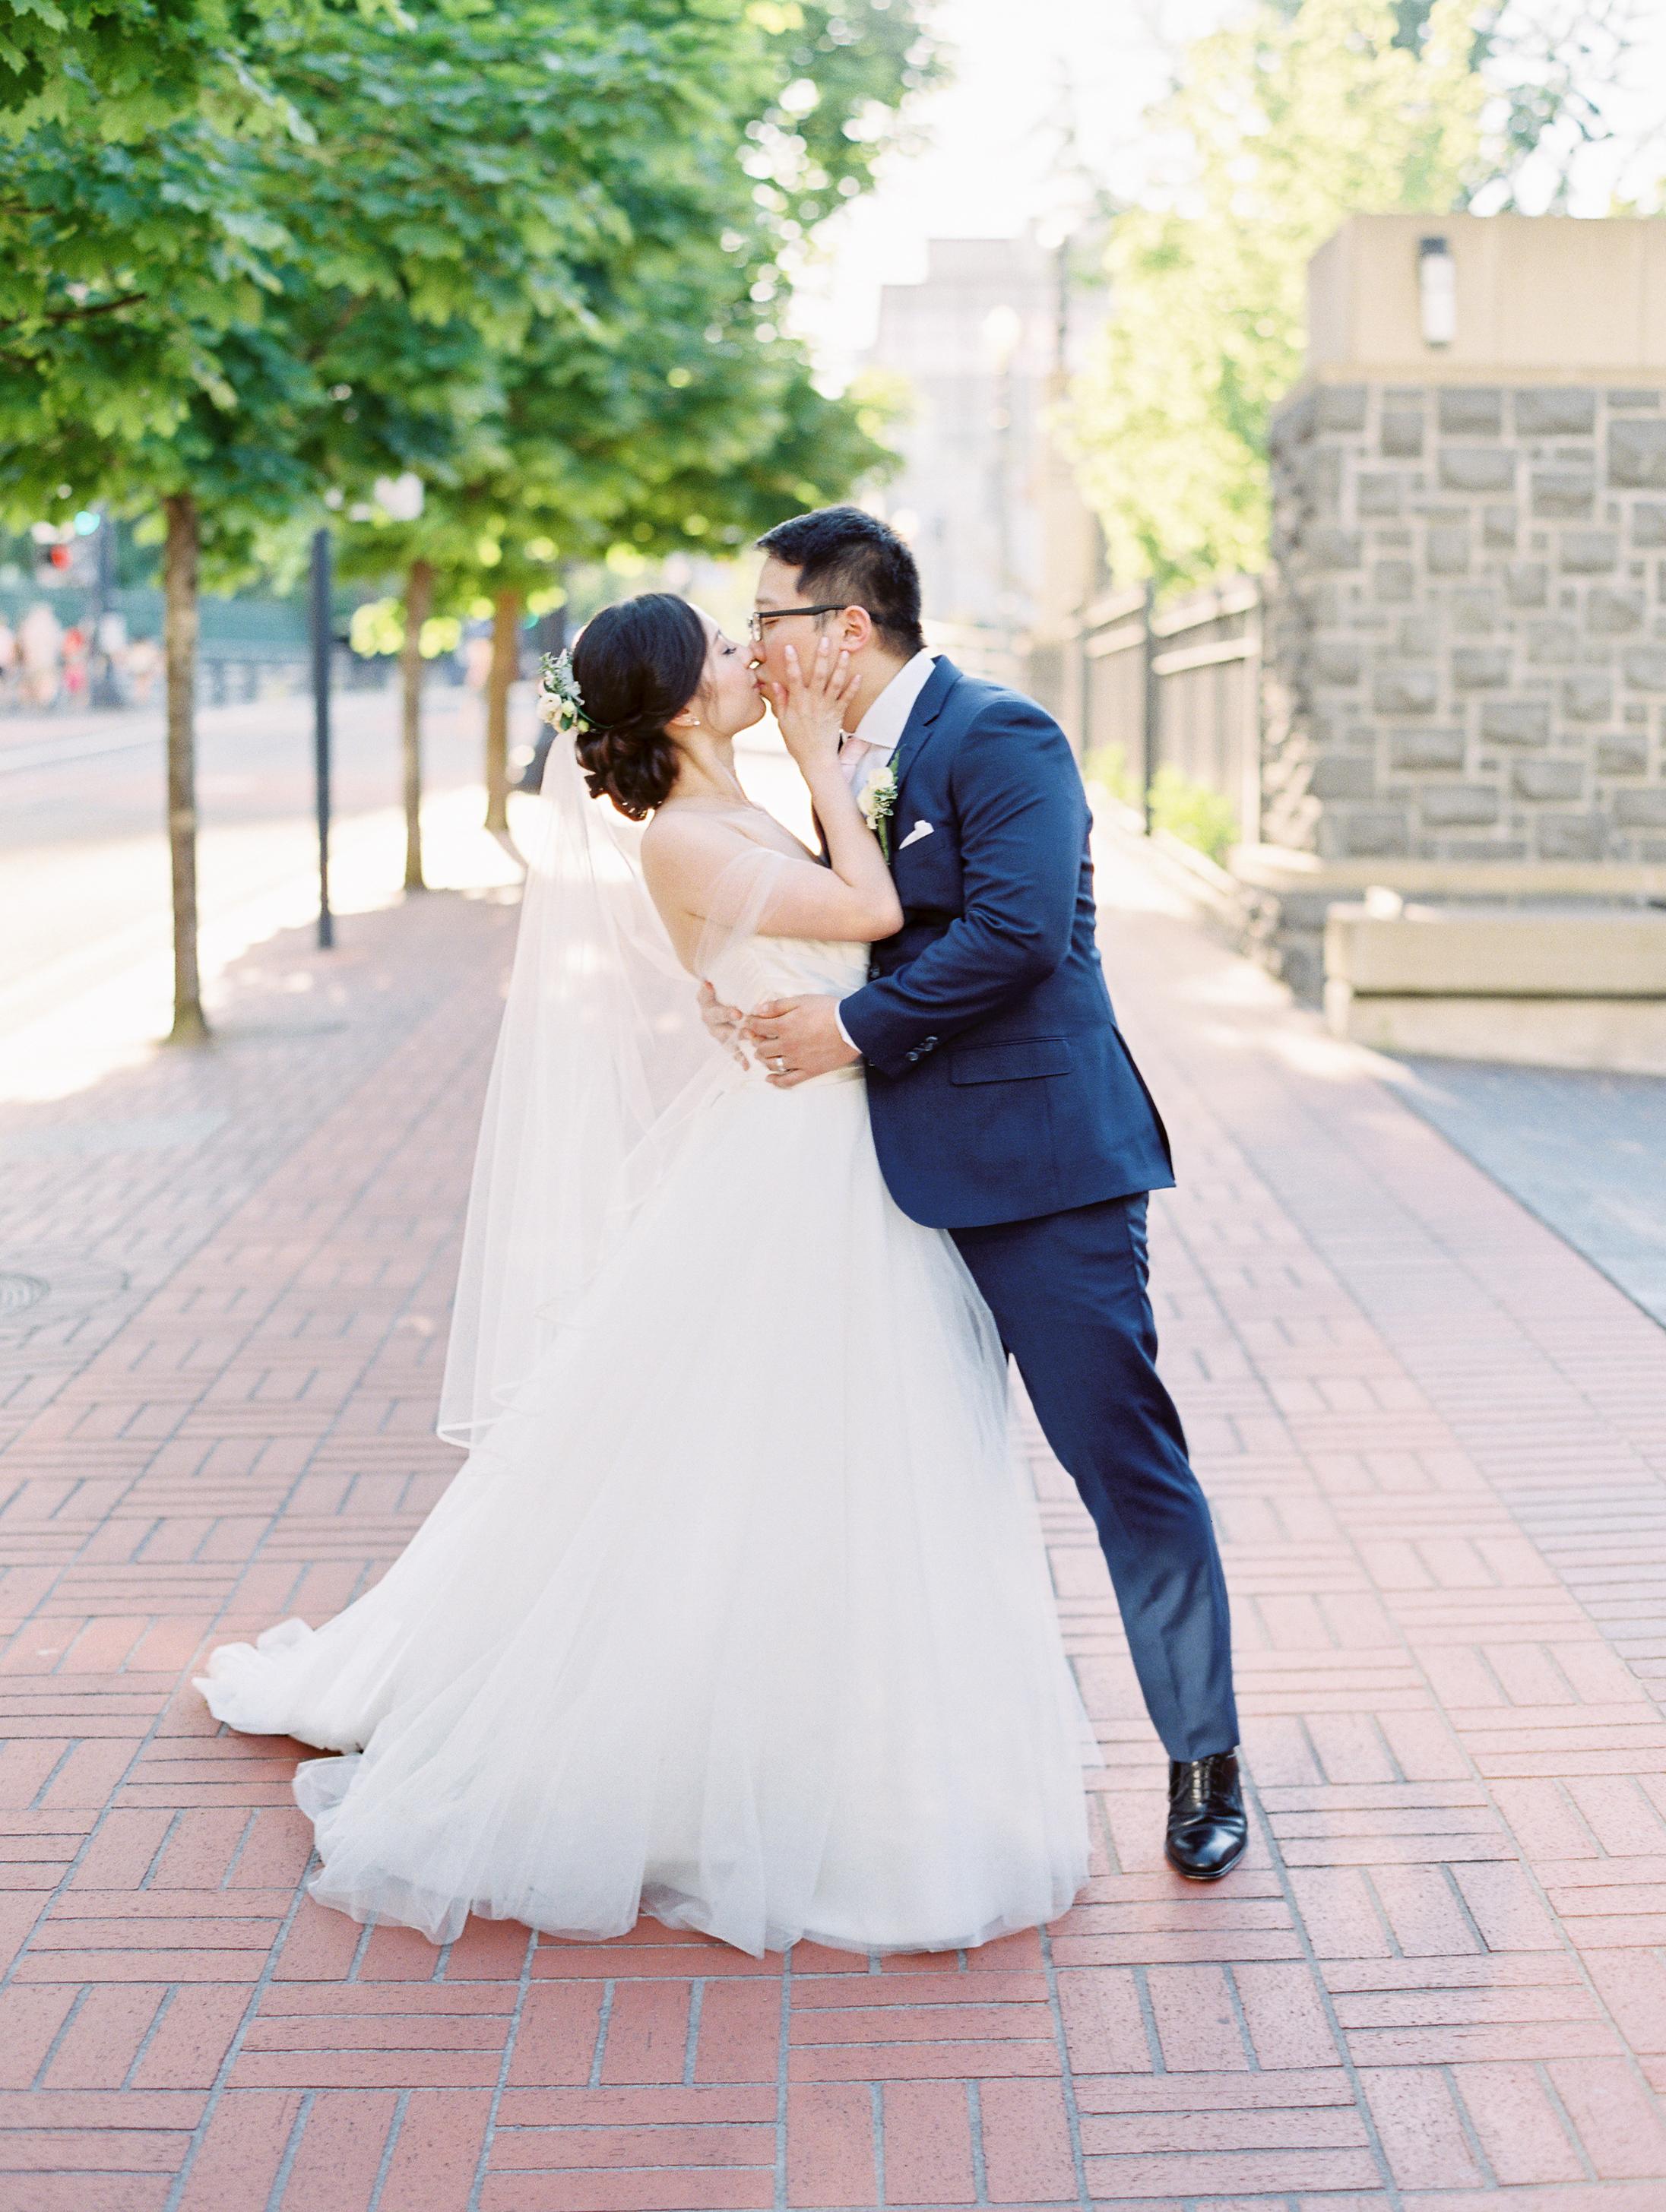 union-pine-wedding-portland-10.jpg